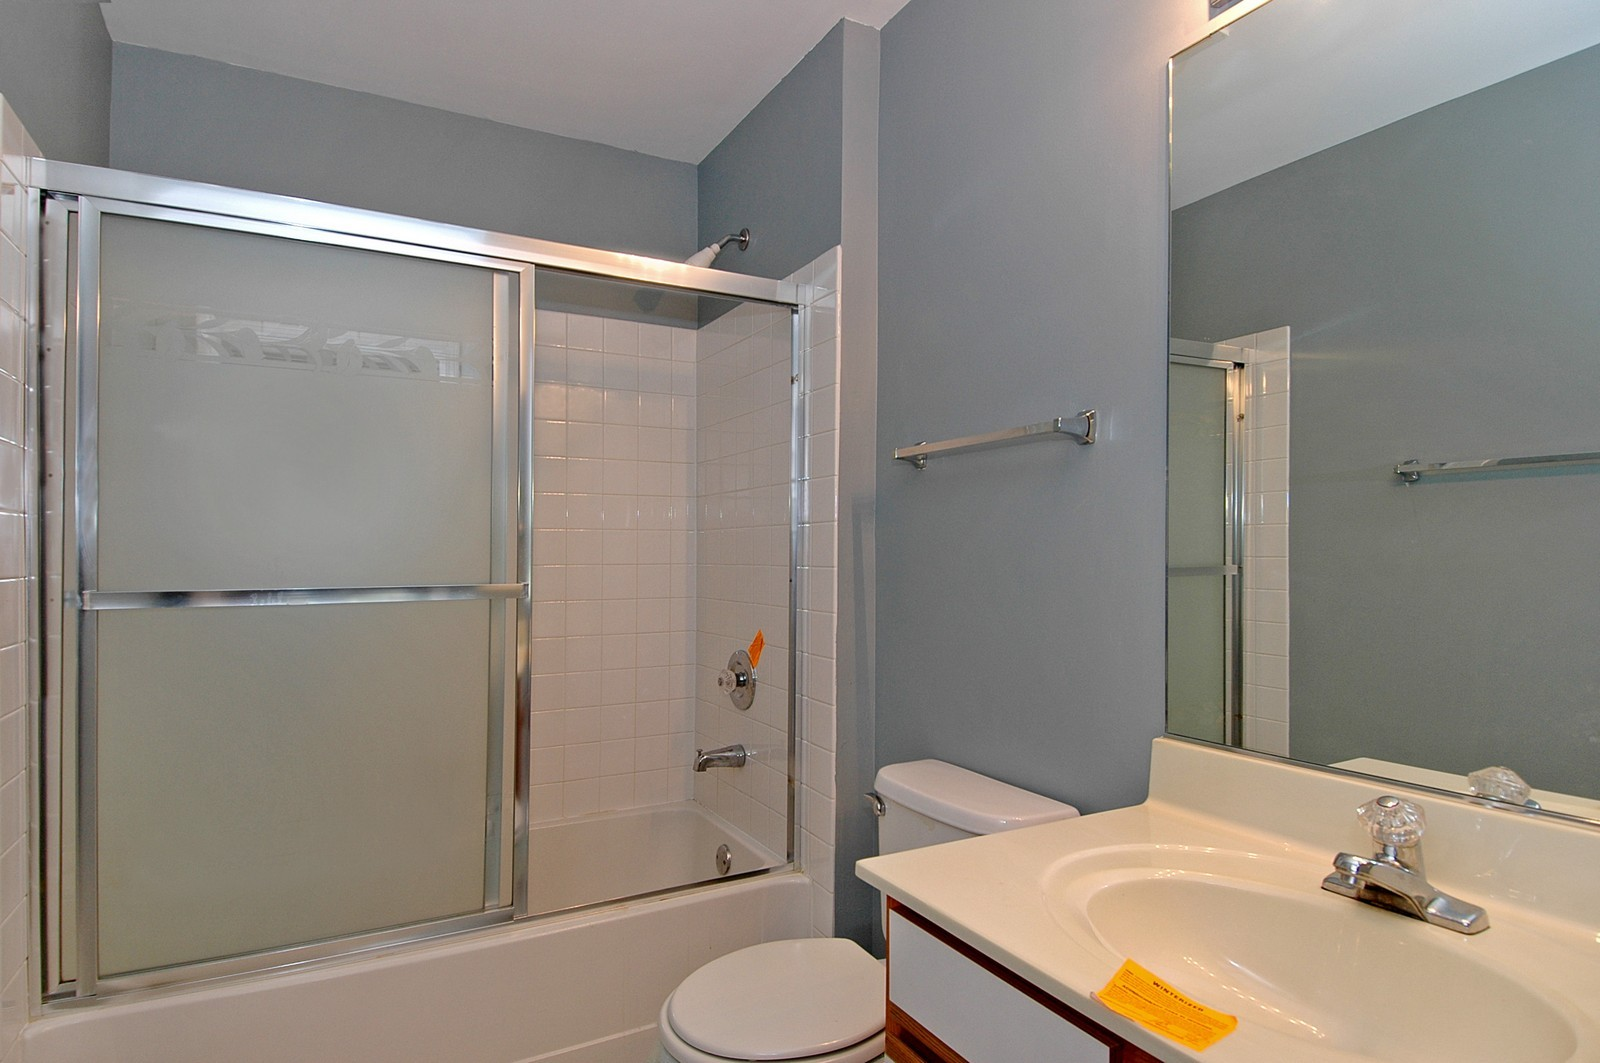 Real Estate Photography - 360 Crystal Ridge Dr, Unit A, Crystal Lake, IL, 60014 - Bathroom